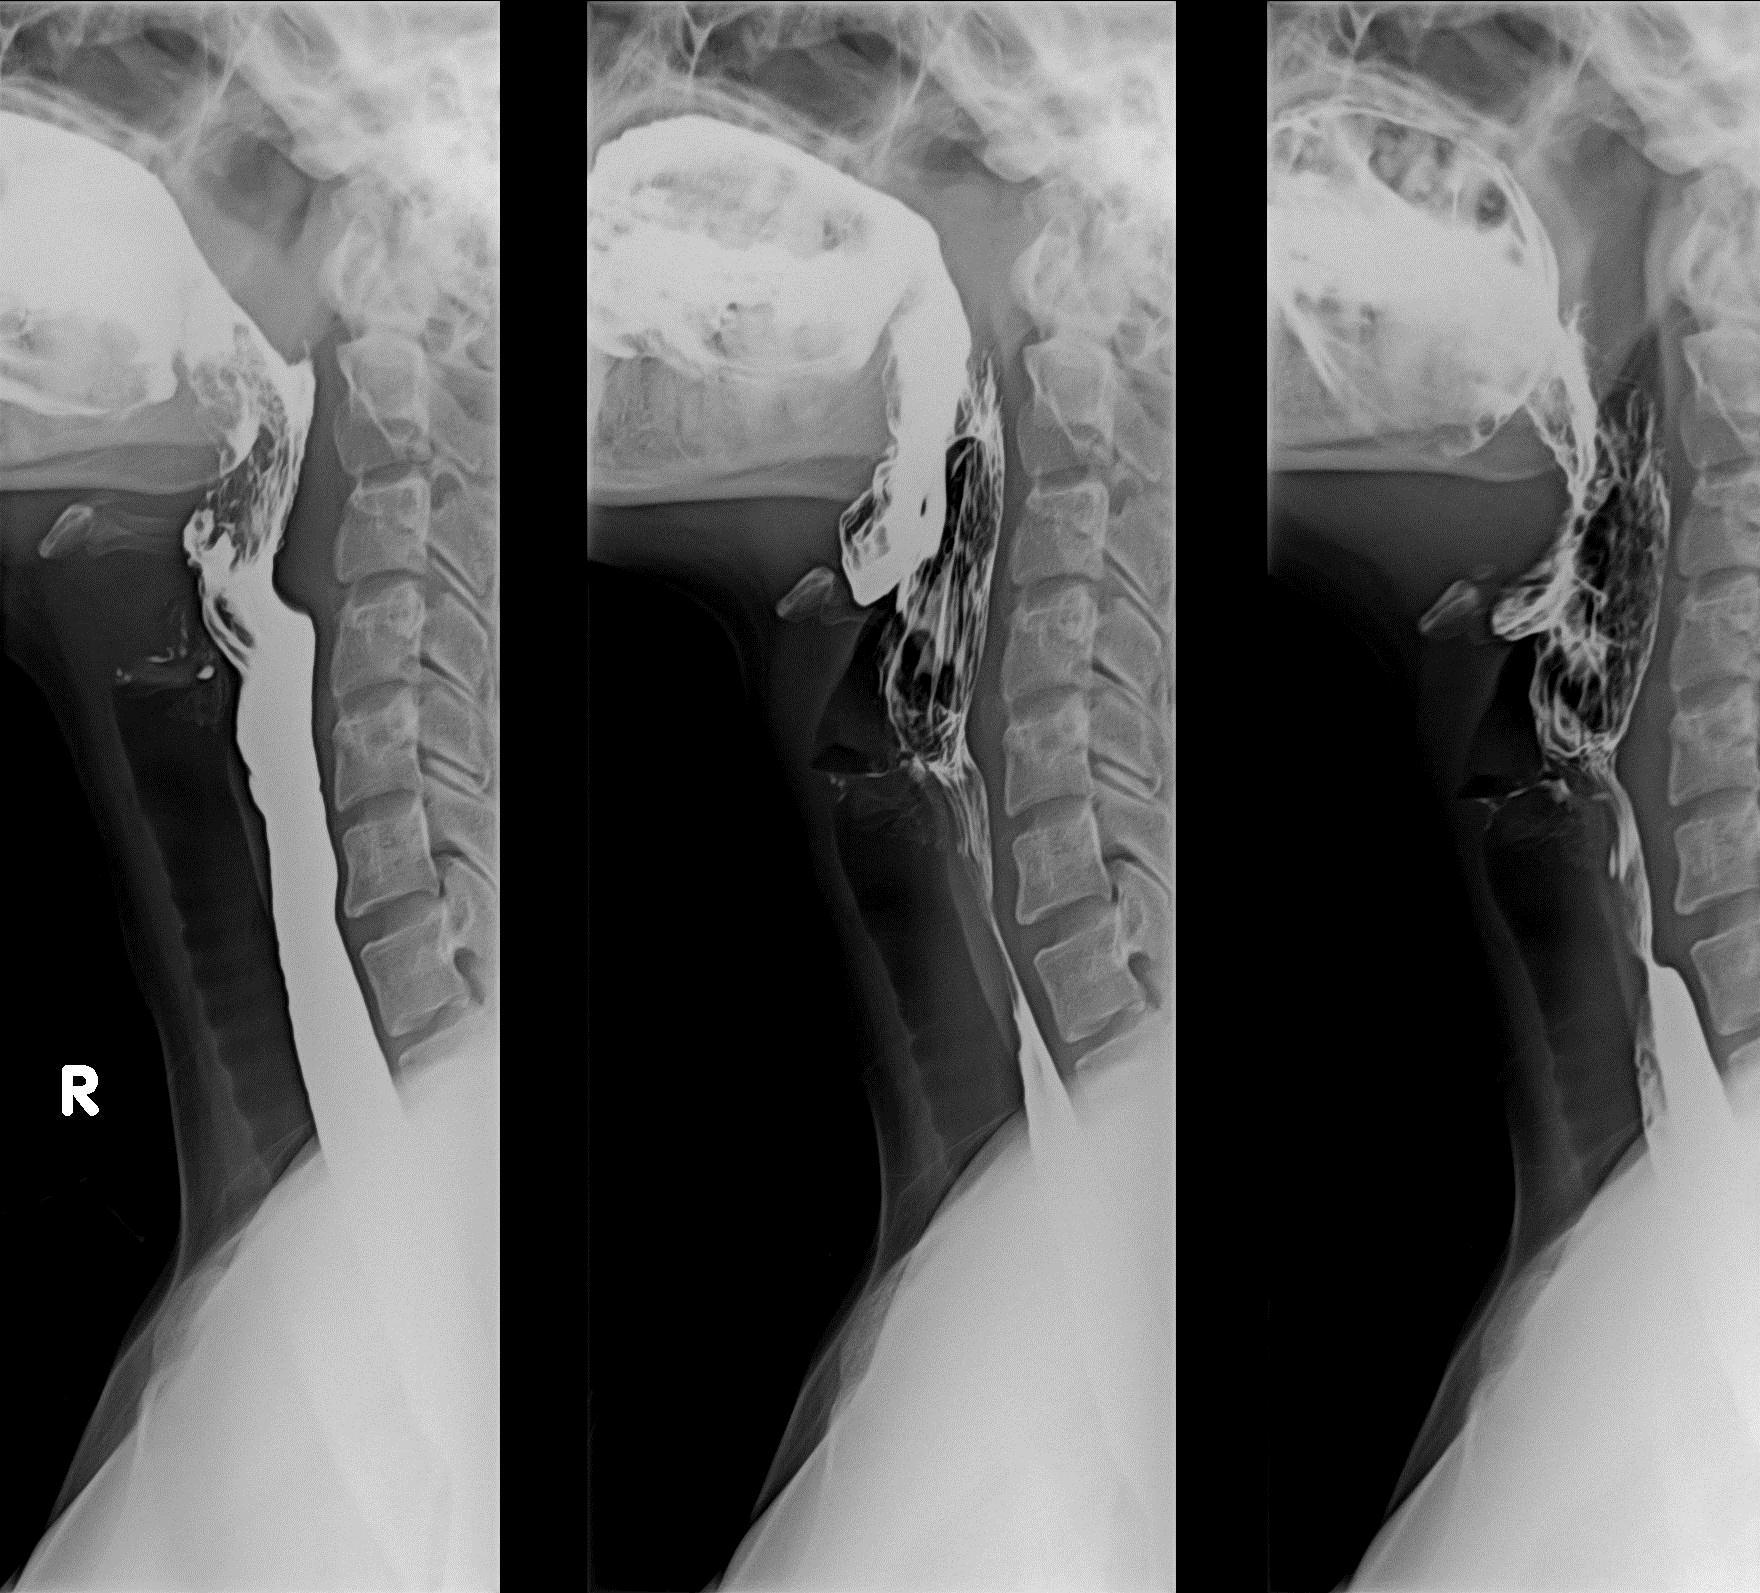 Barium Swallow (Barium Esophagram) What to Expect During Test